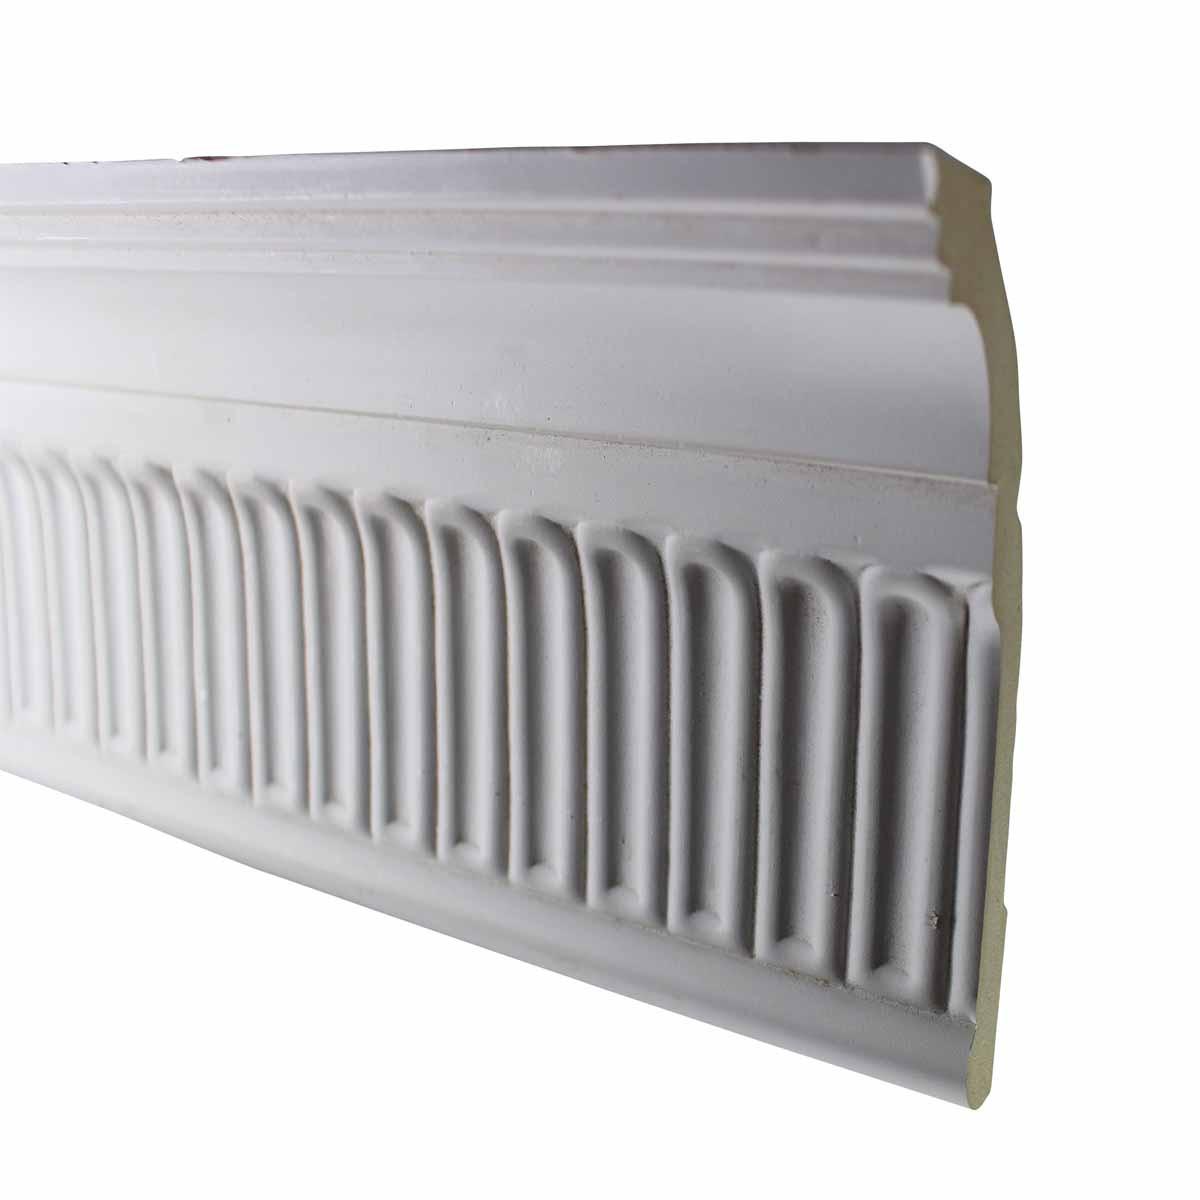 Cornice Withe Urethane Sample of 12333 24 Cornice Cornice Moulding Cornice Molding